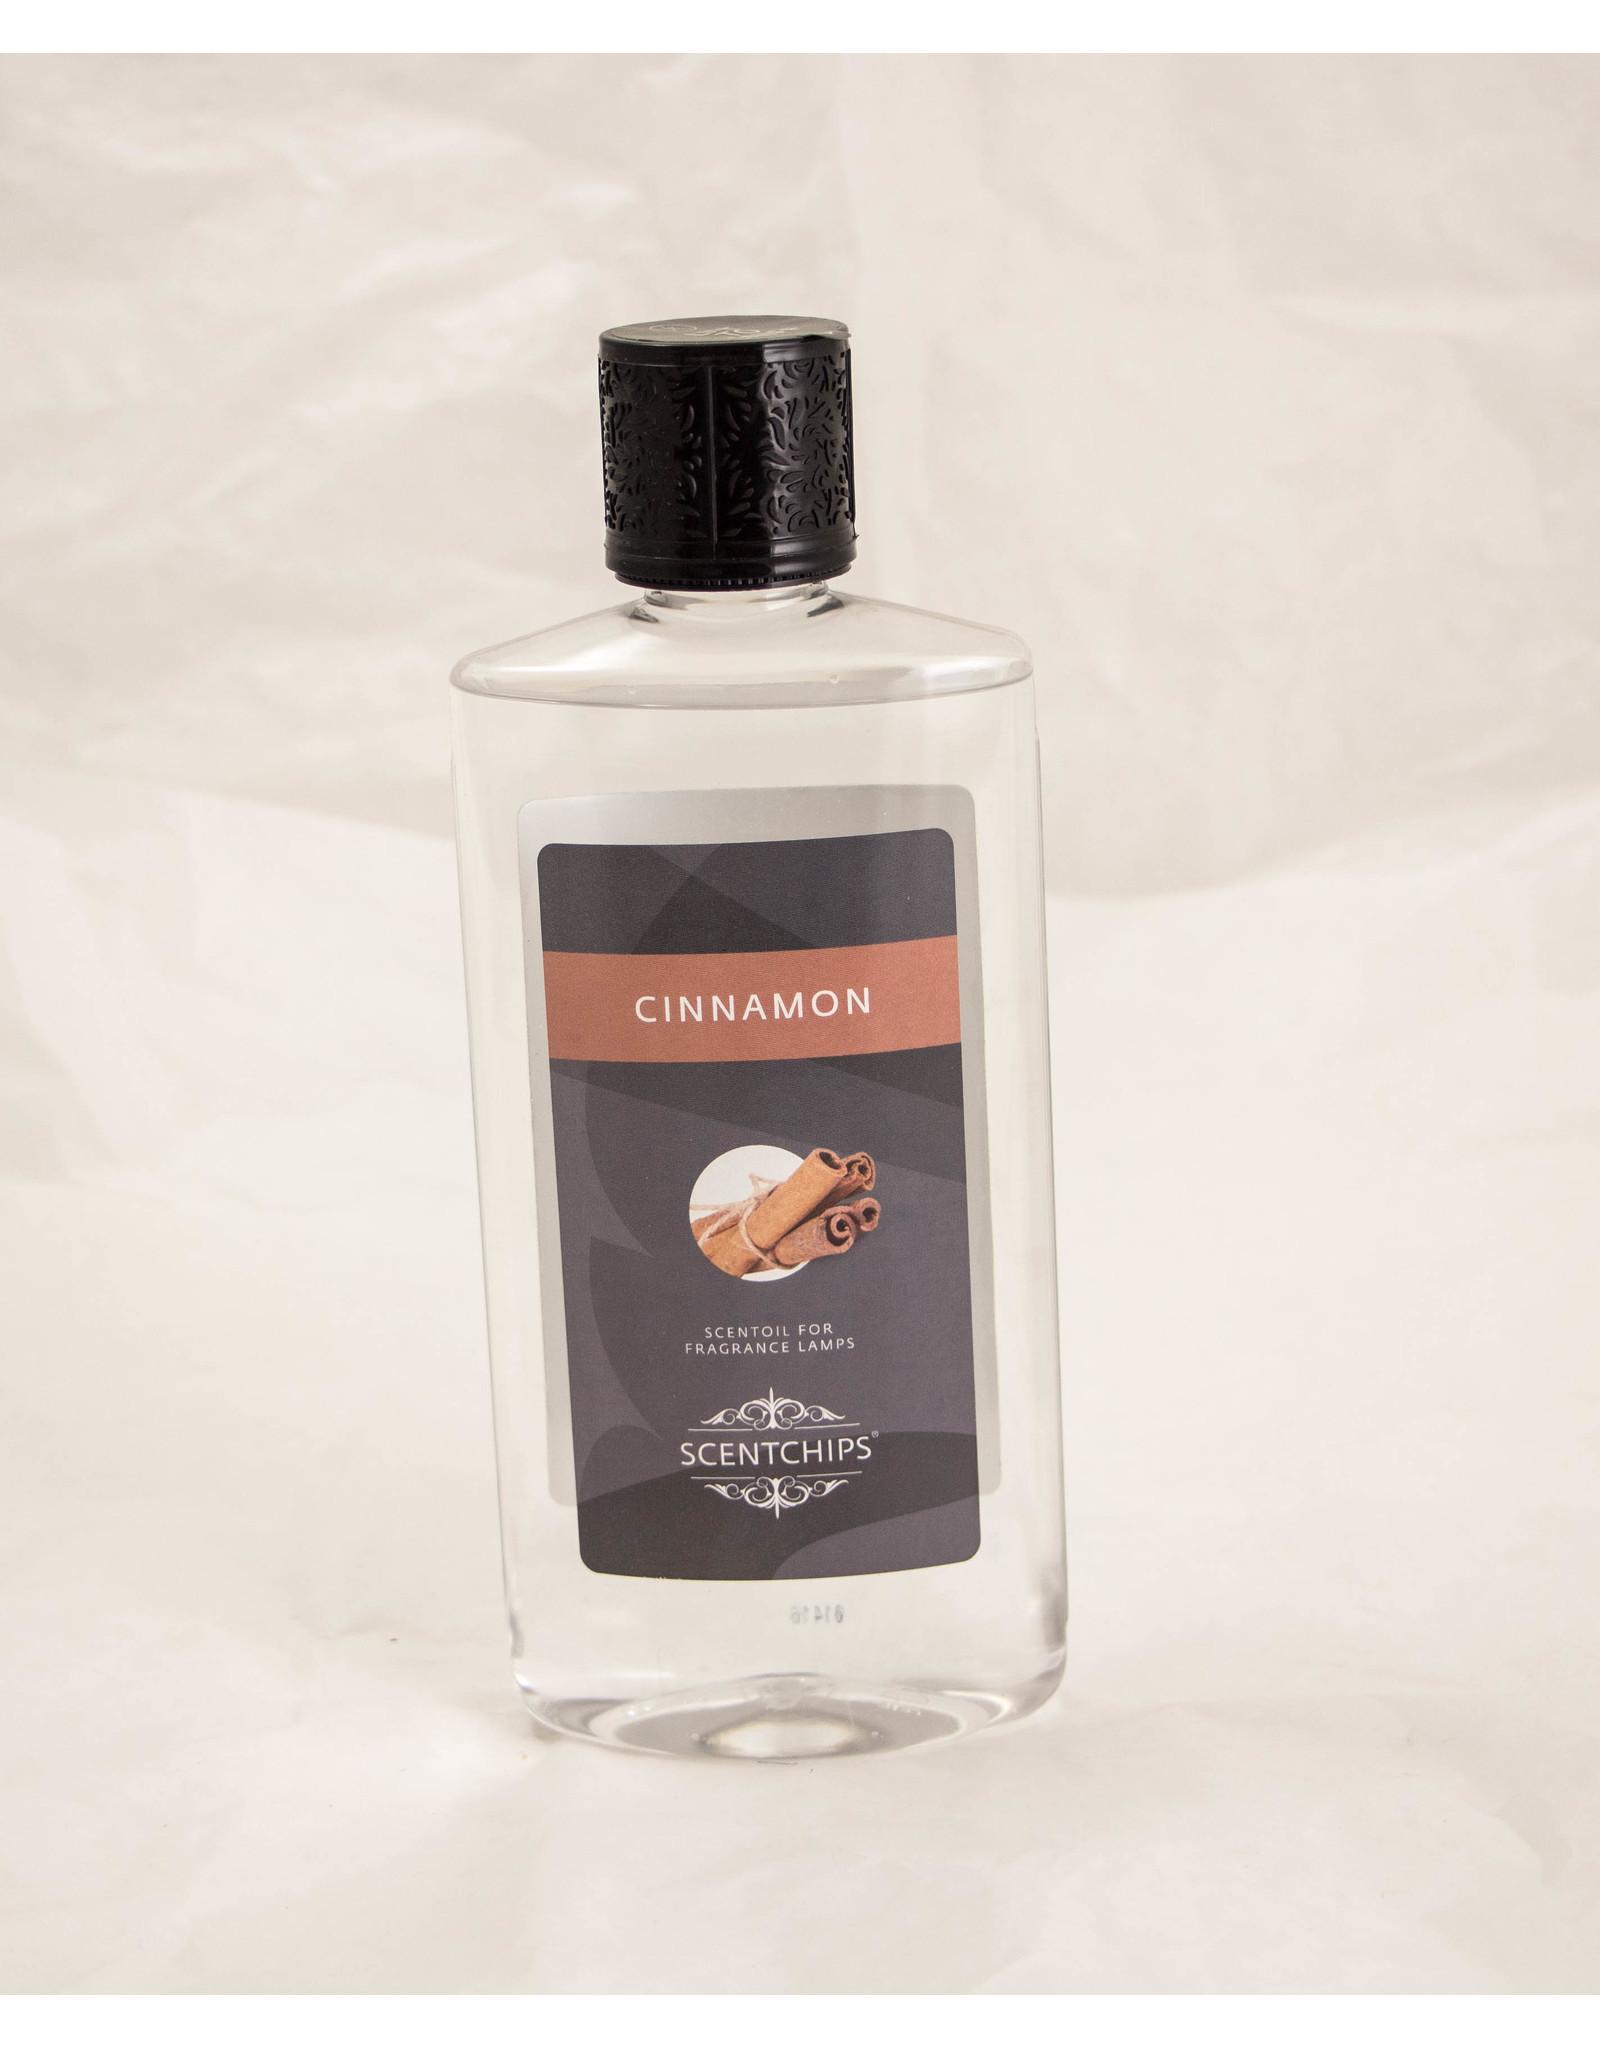 ScentChips Cinnamon 475ml